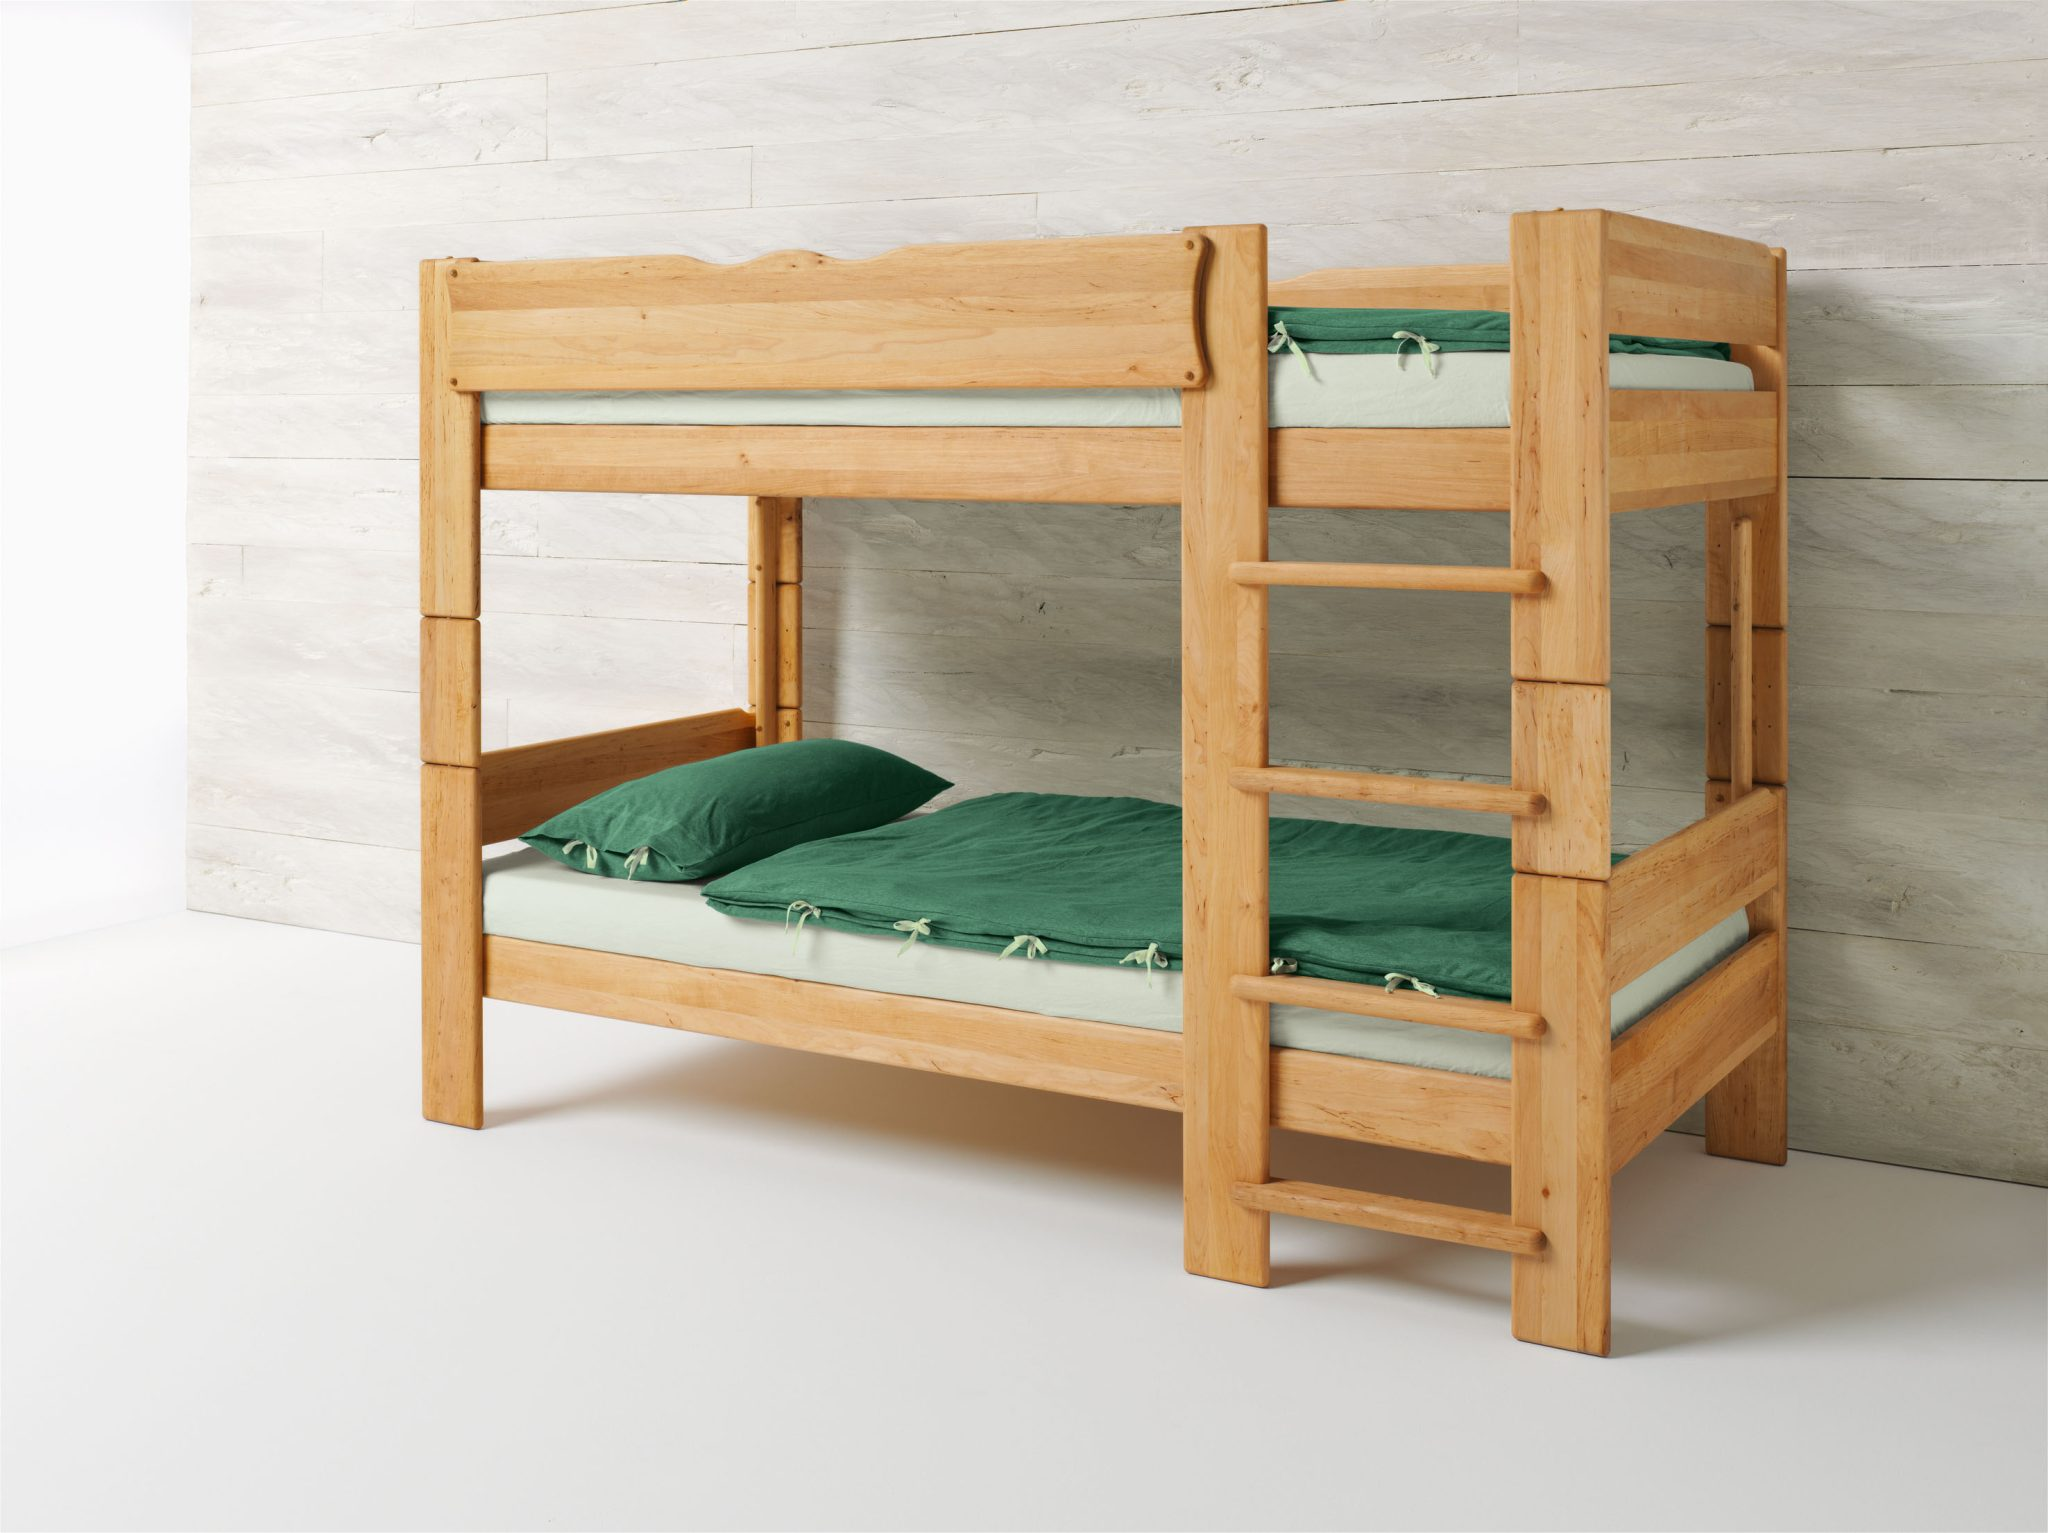 kinderbett massivholz wien. Black Bedroom Furniture Sets. Home Design Ideas